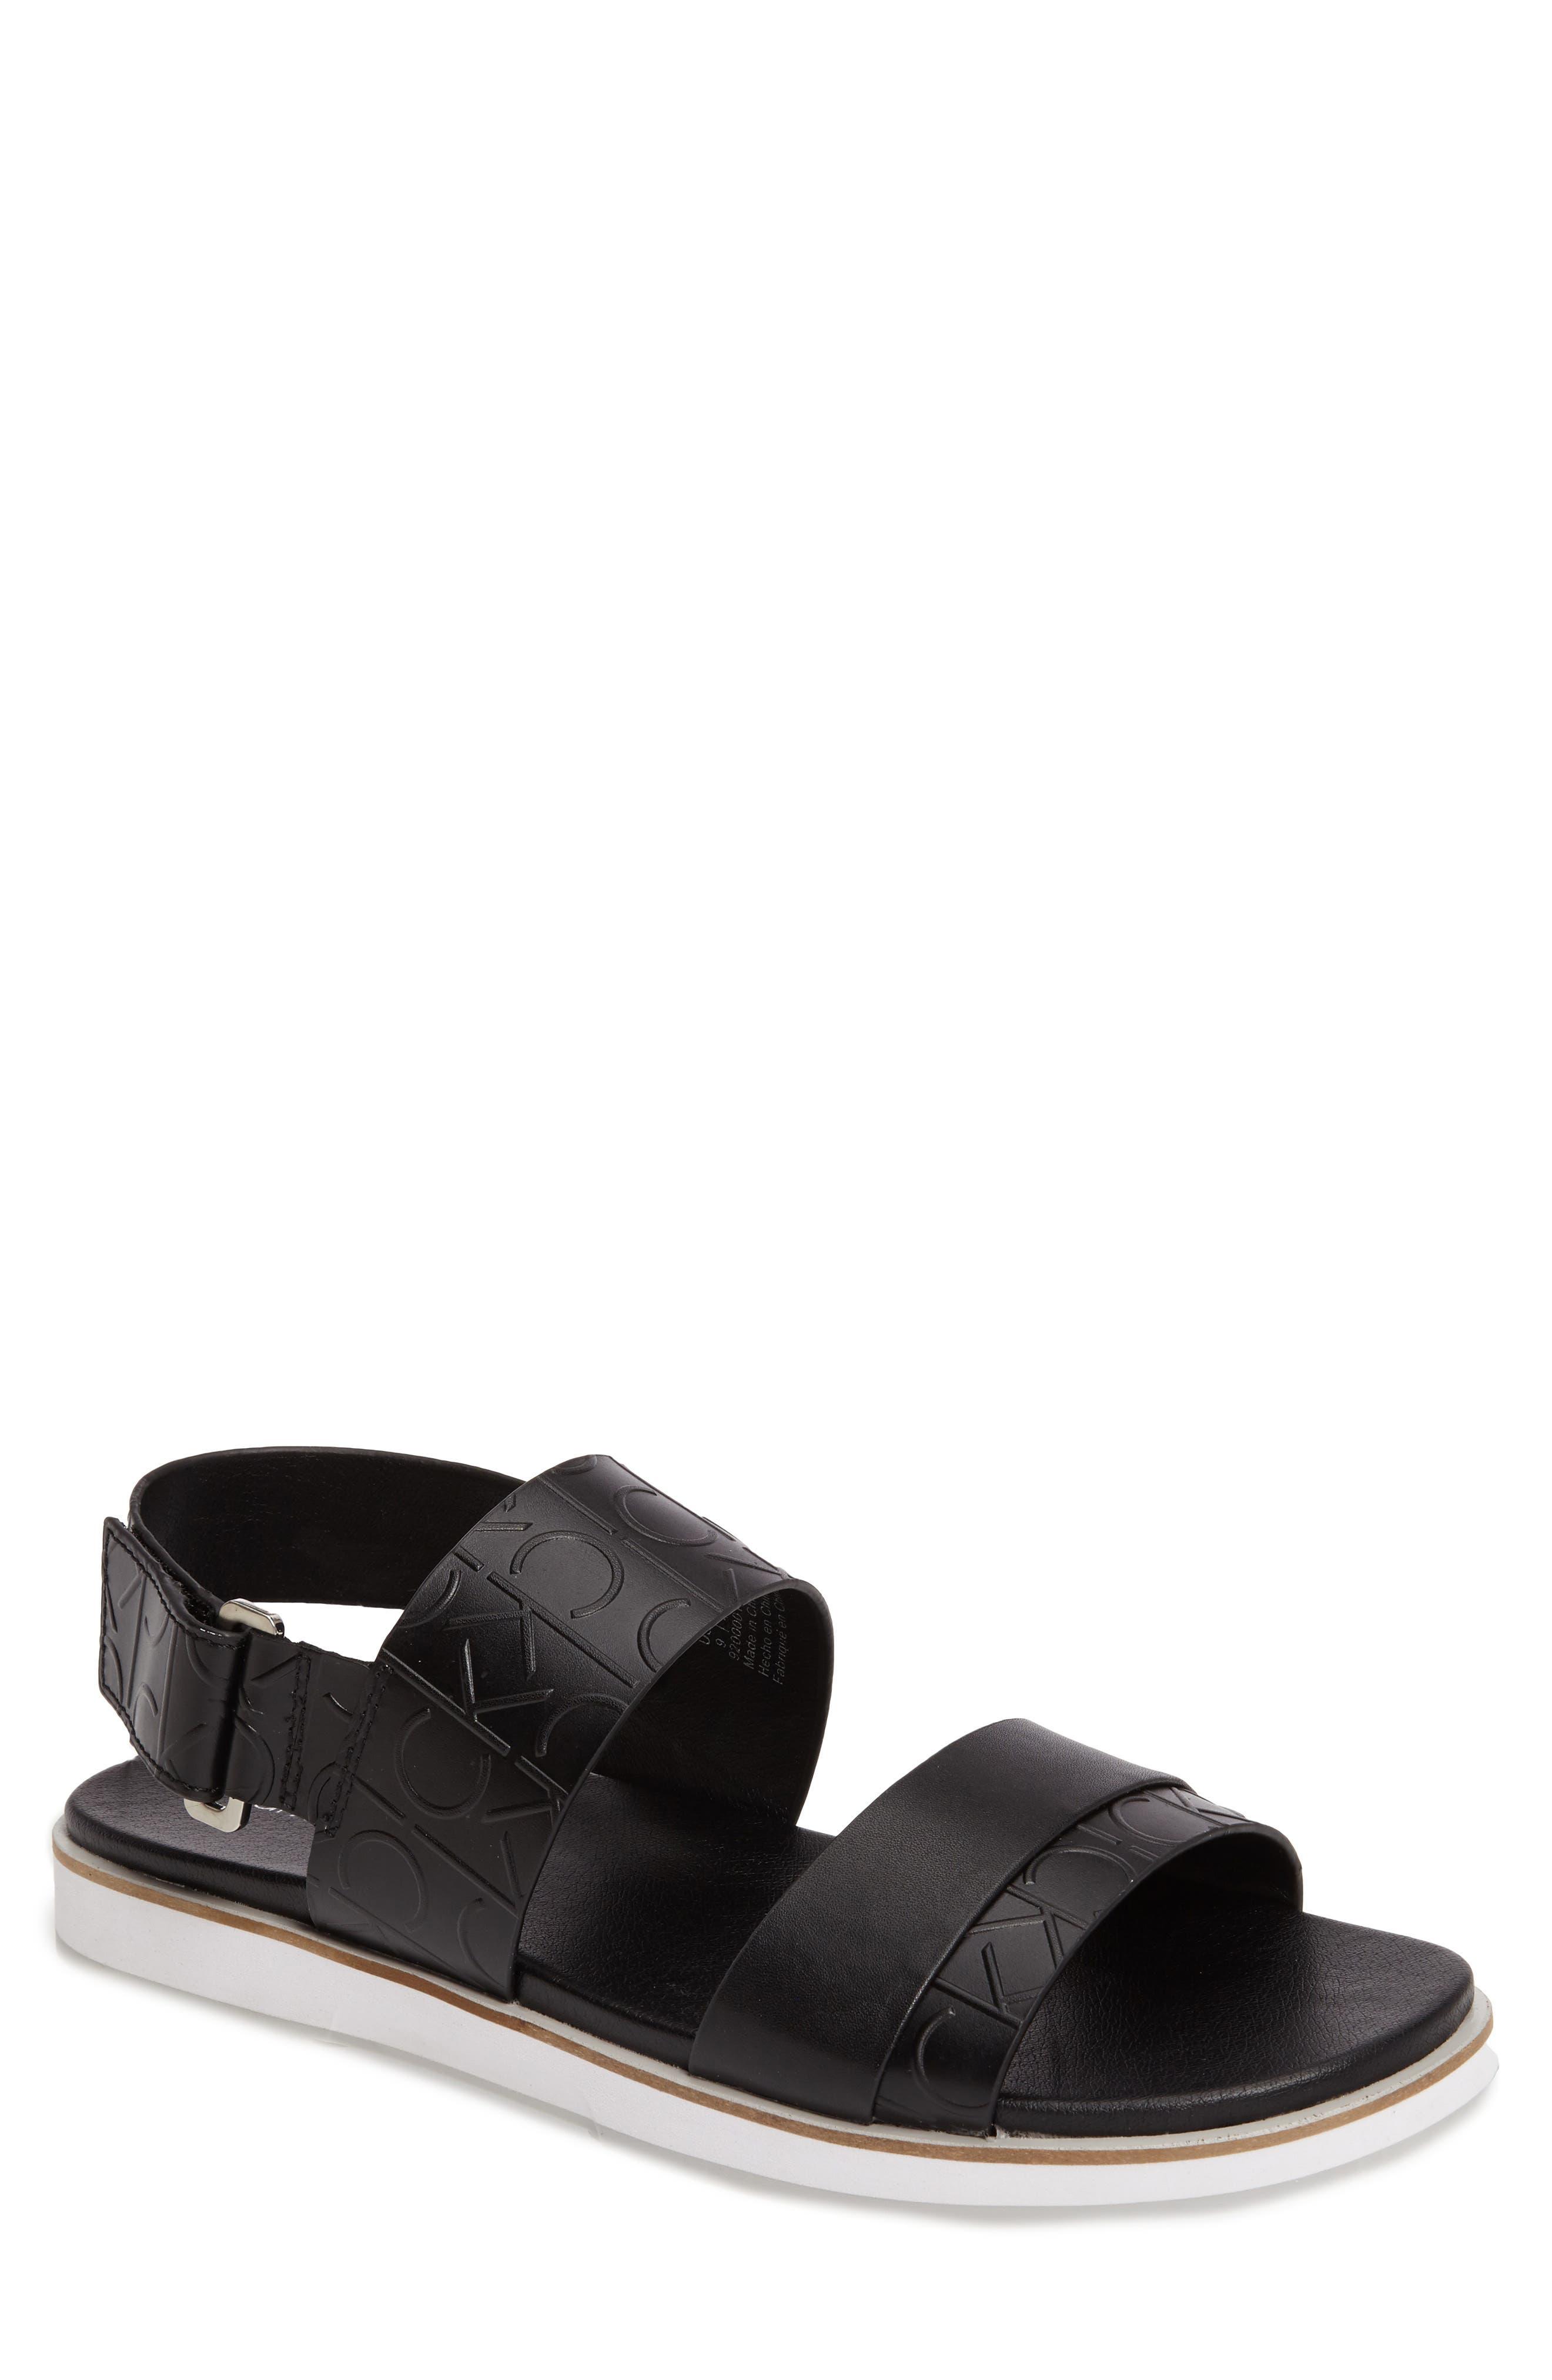 'Dex' Embossed Leather Sandal,                             Main thumbnail 1, color,                             Black/Black